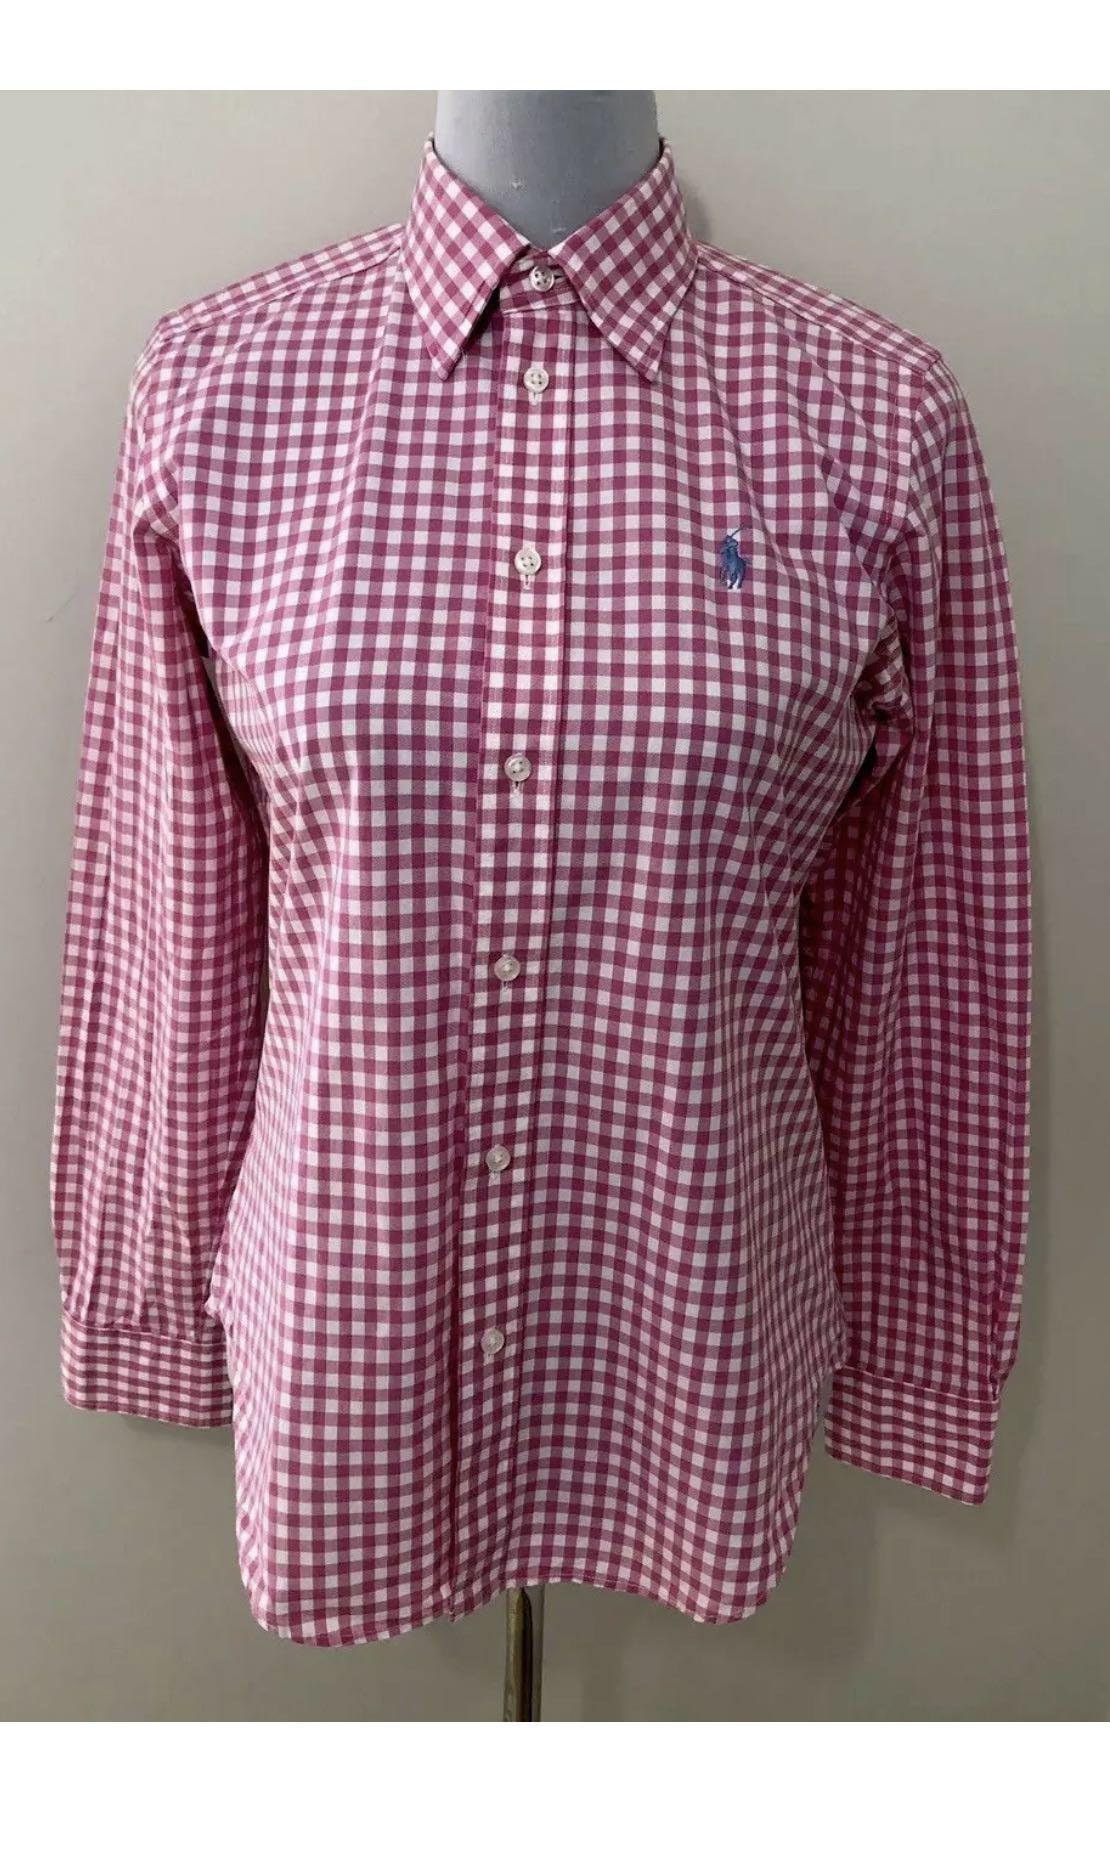 Ladies RALPH LAUREN SPORT Pink Check Shirt. Size 8-10.